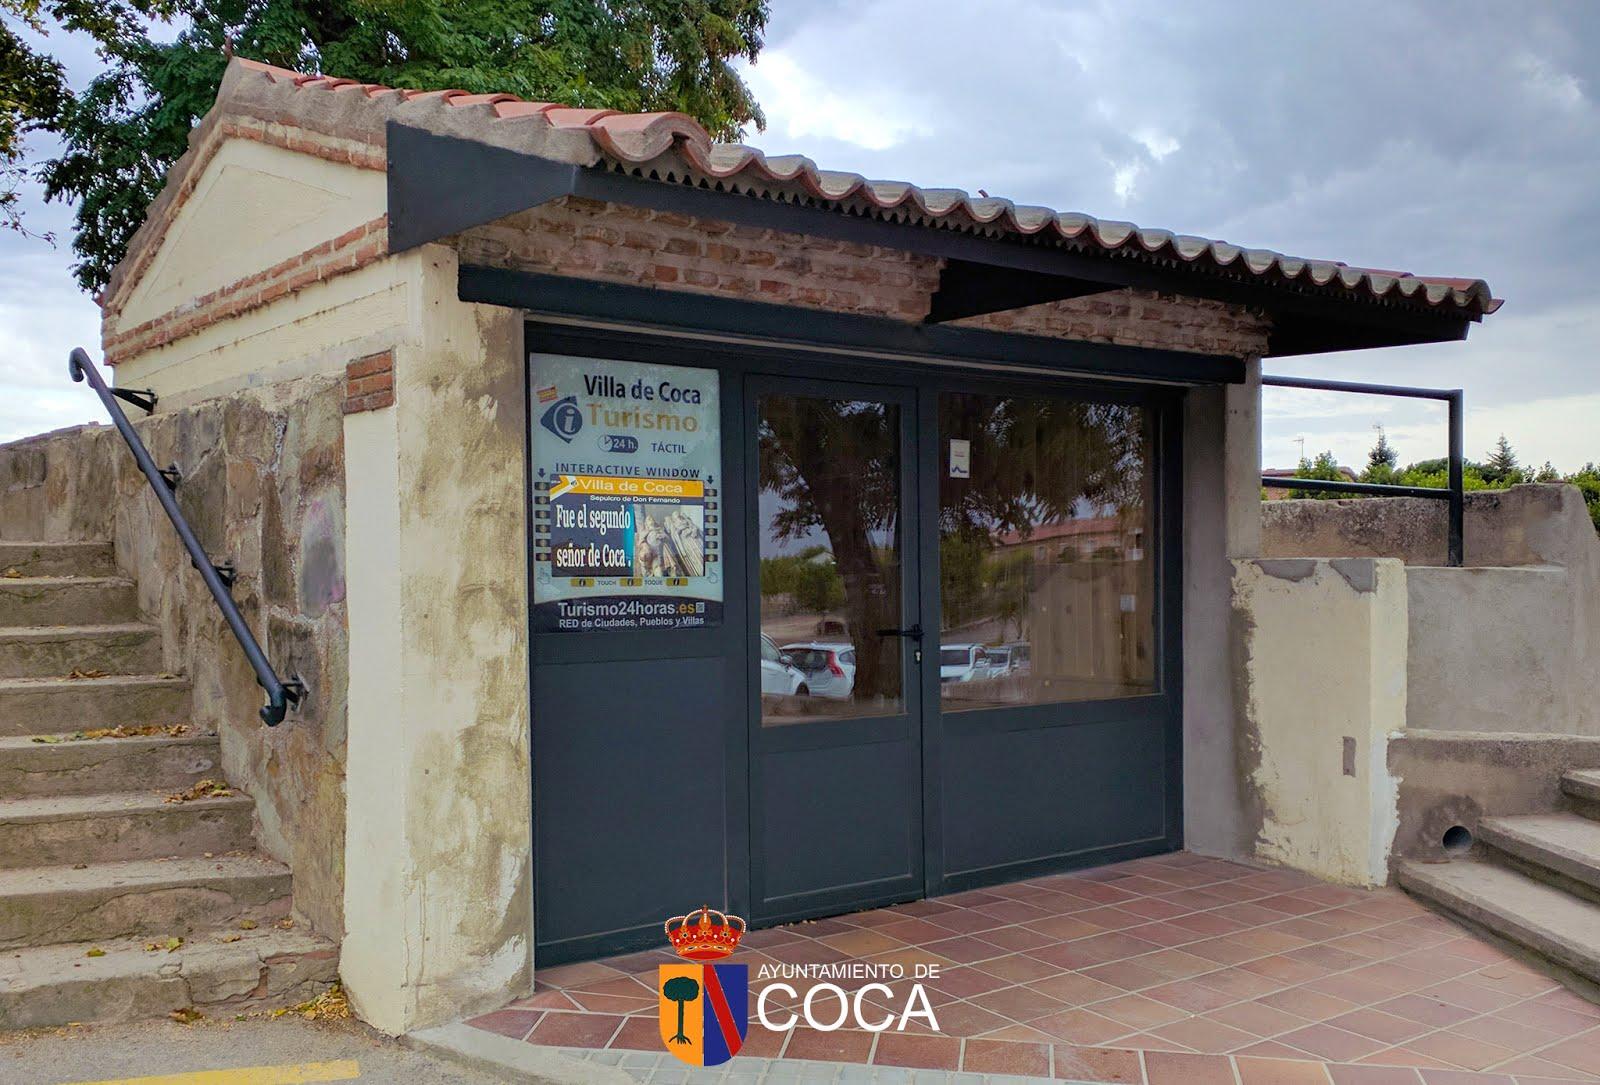 P gina web oficial del ayuntamiento de coca segovia for Segovia oficina de turismo